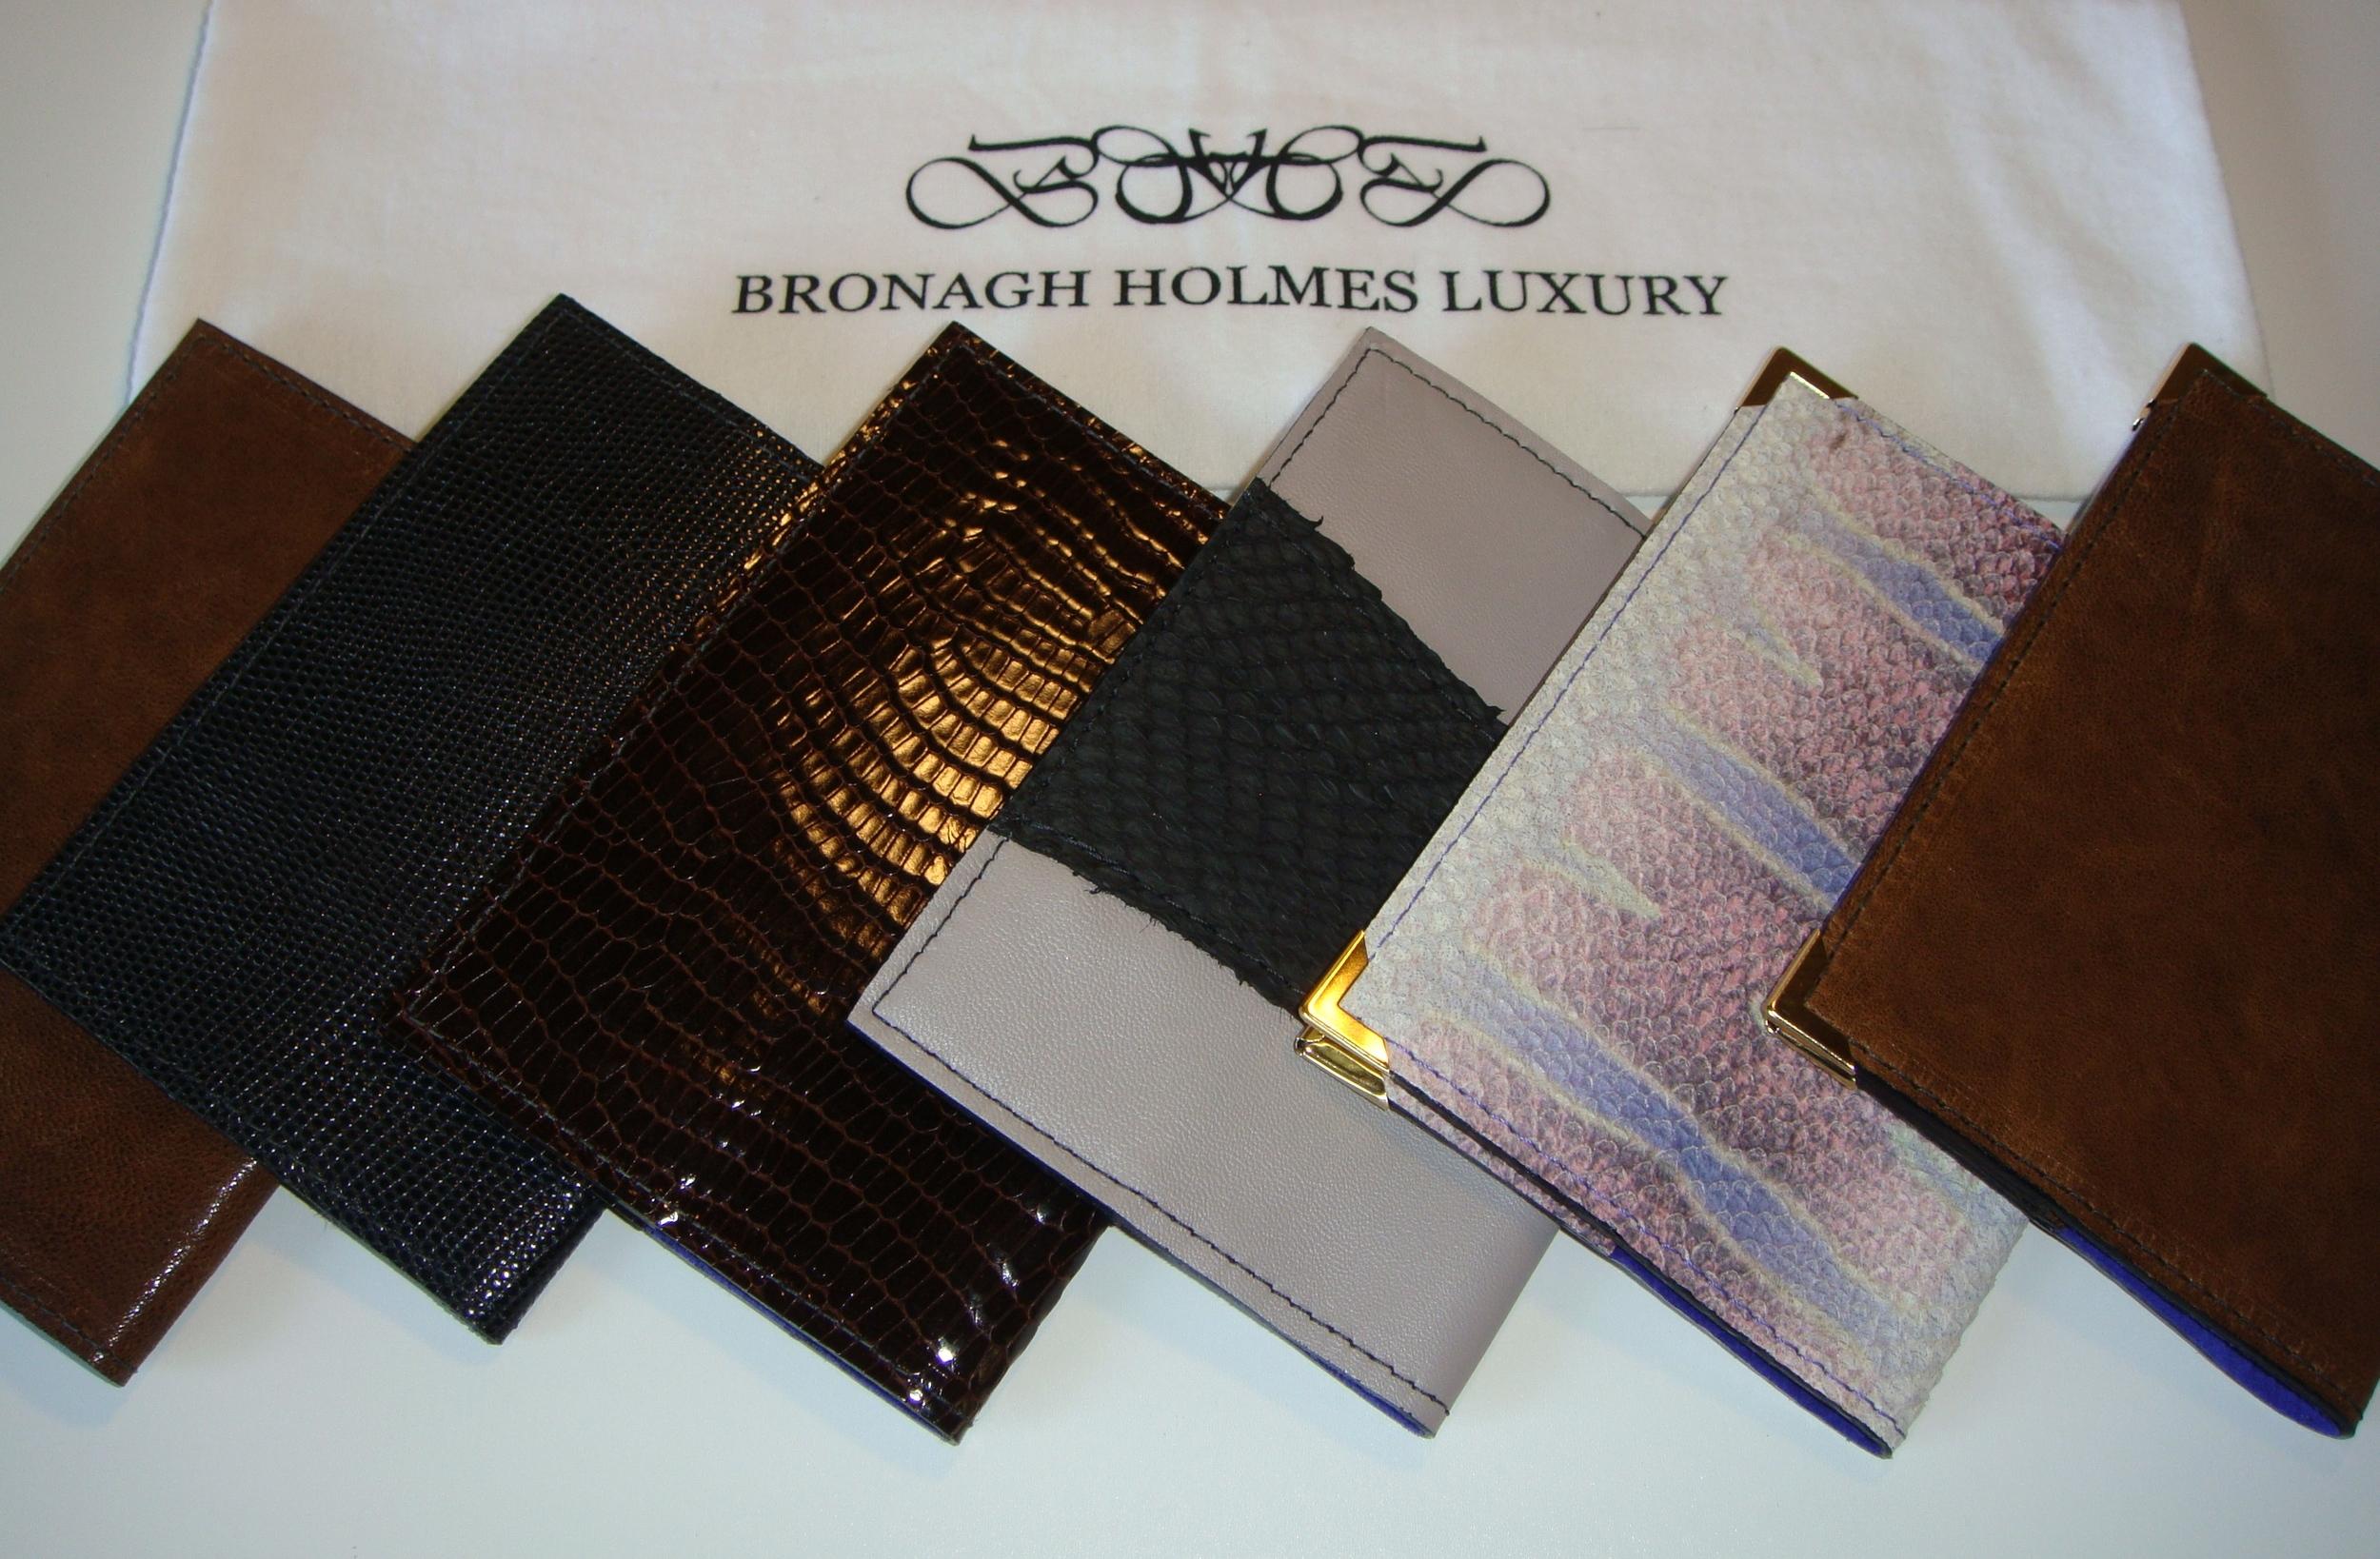 Bronagh Holmes Luxury - Aura - Passport Cover - Various